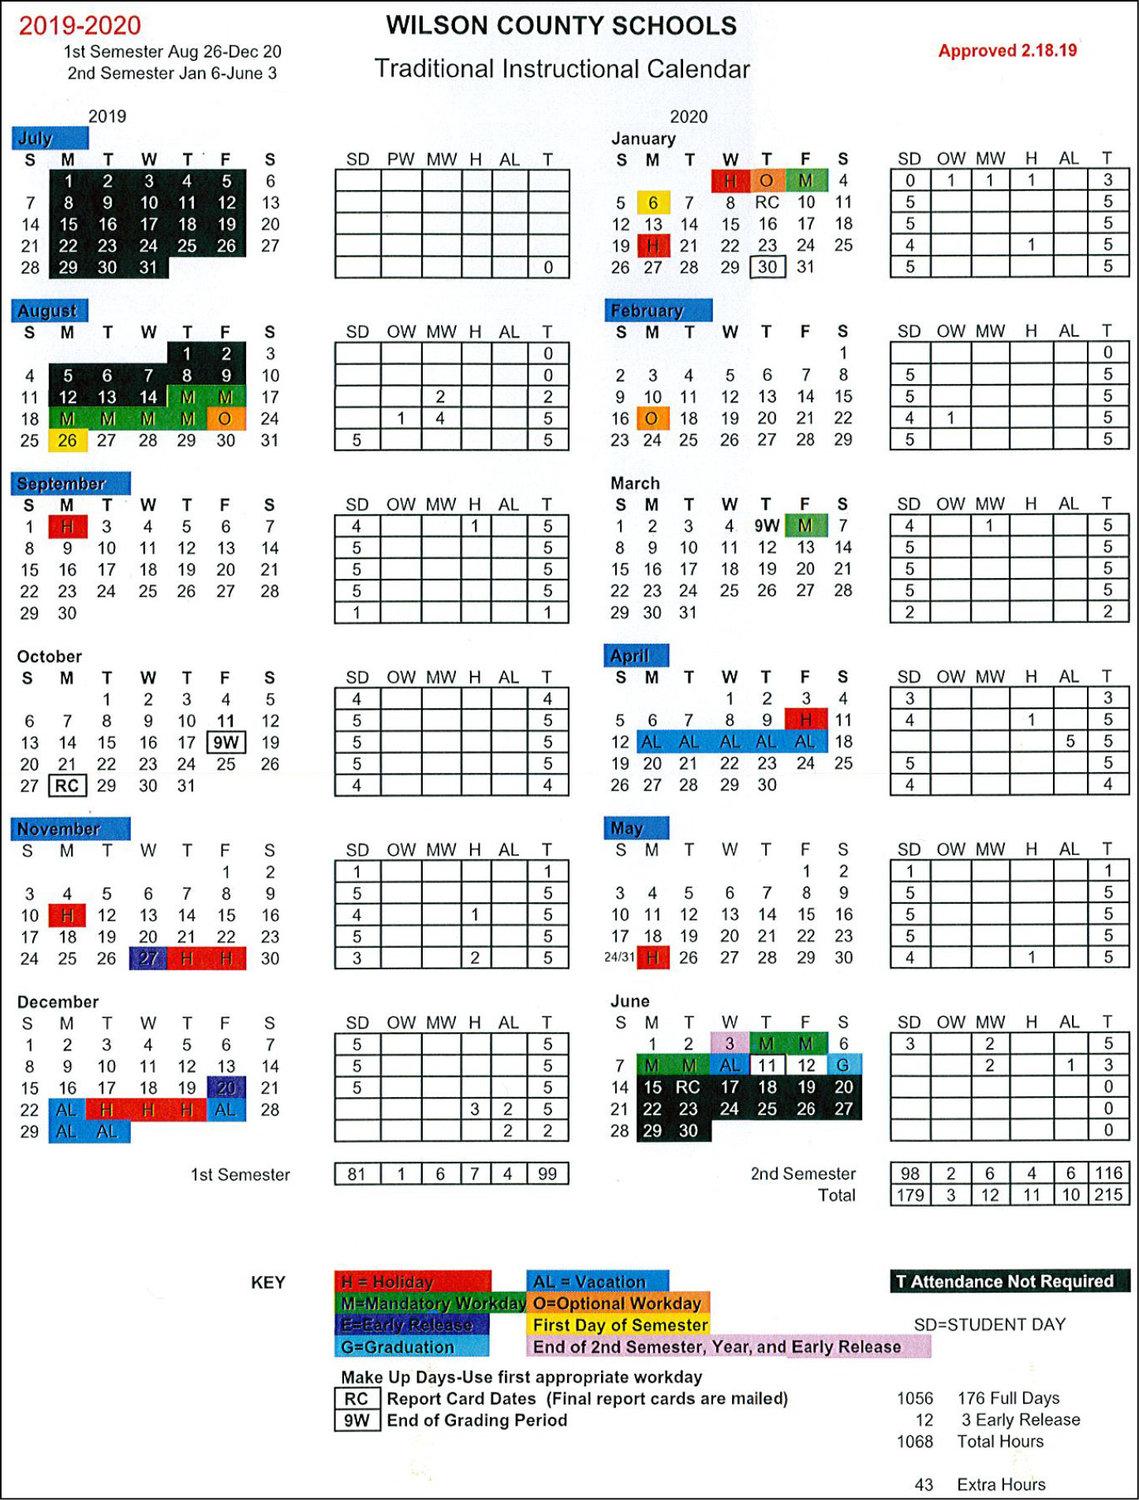 School Board Approves 2019 20 Calendars | The Wilson Times Throughout Wilson Nc Schoold Calendar